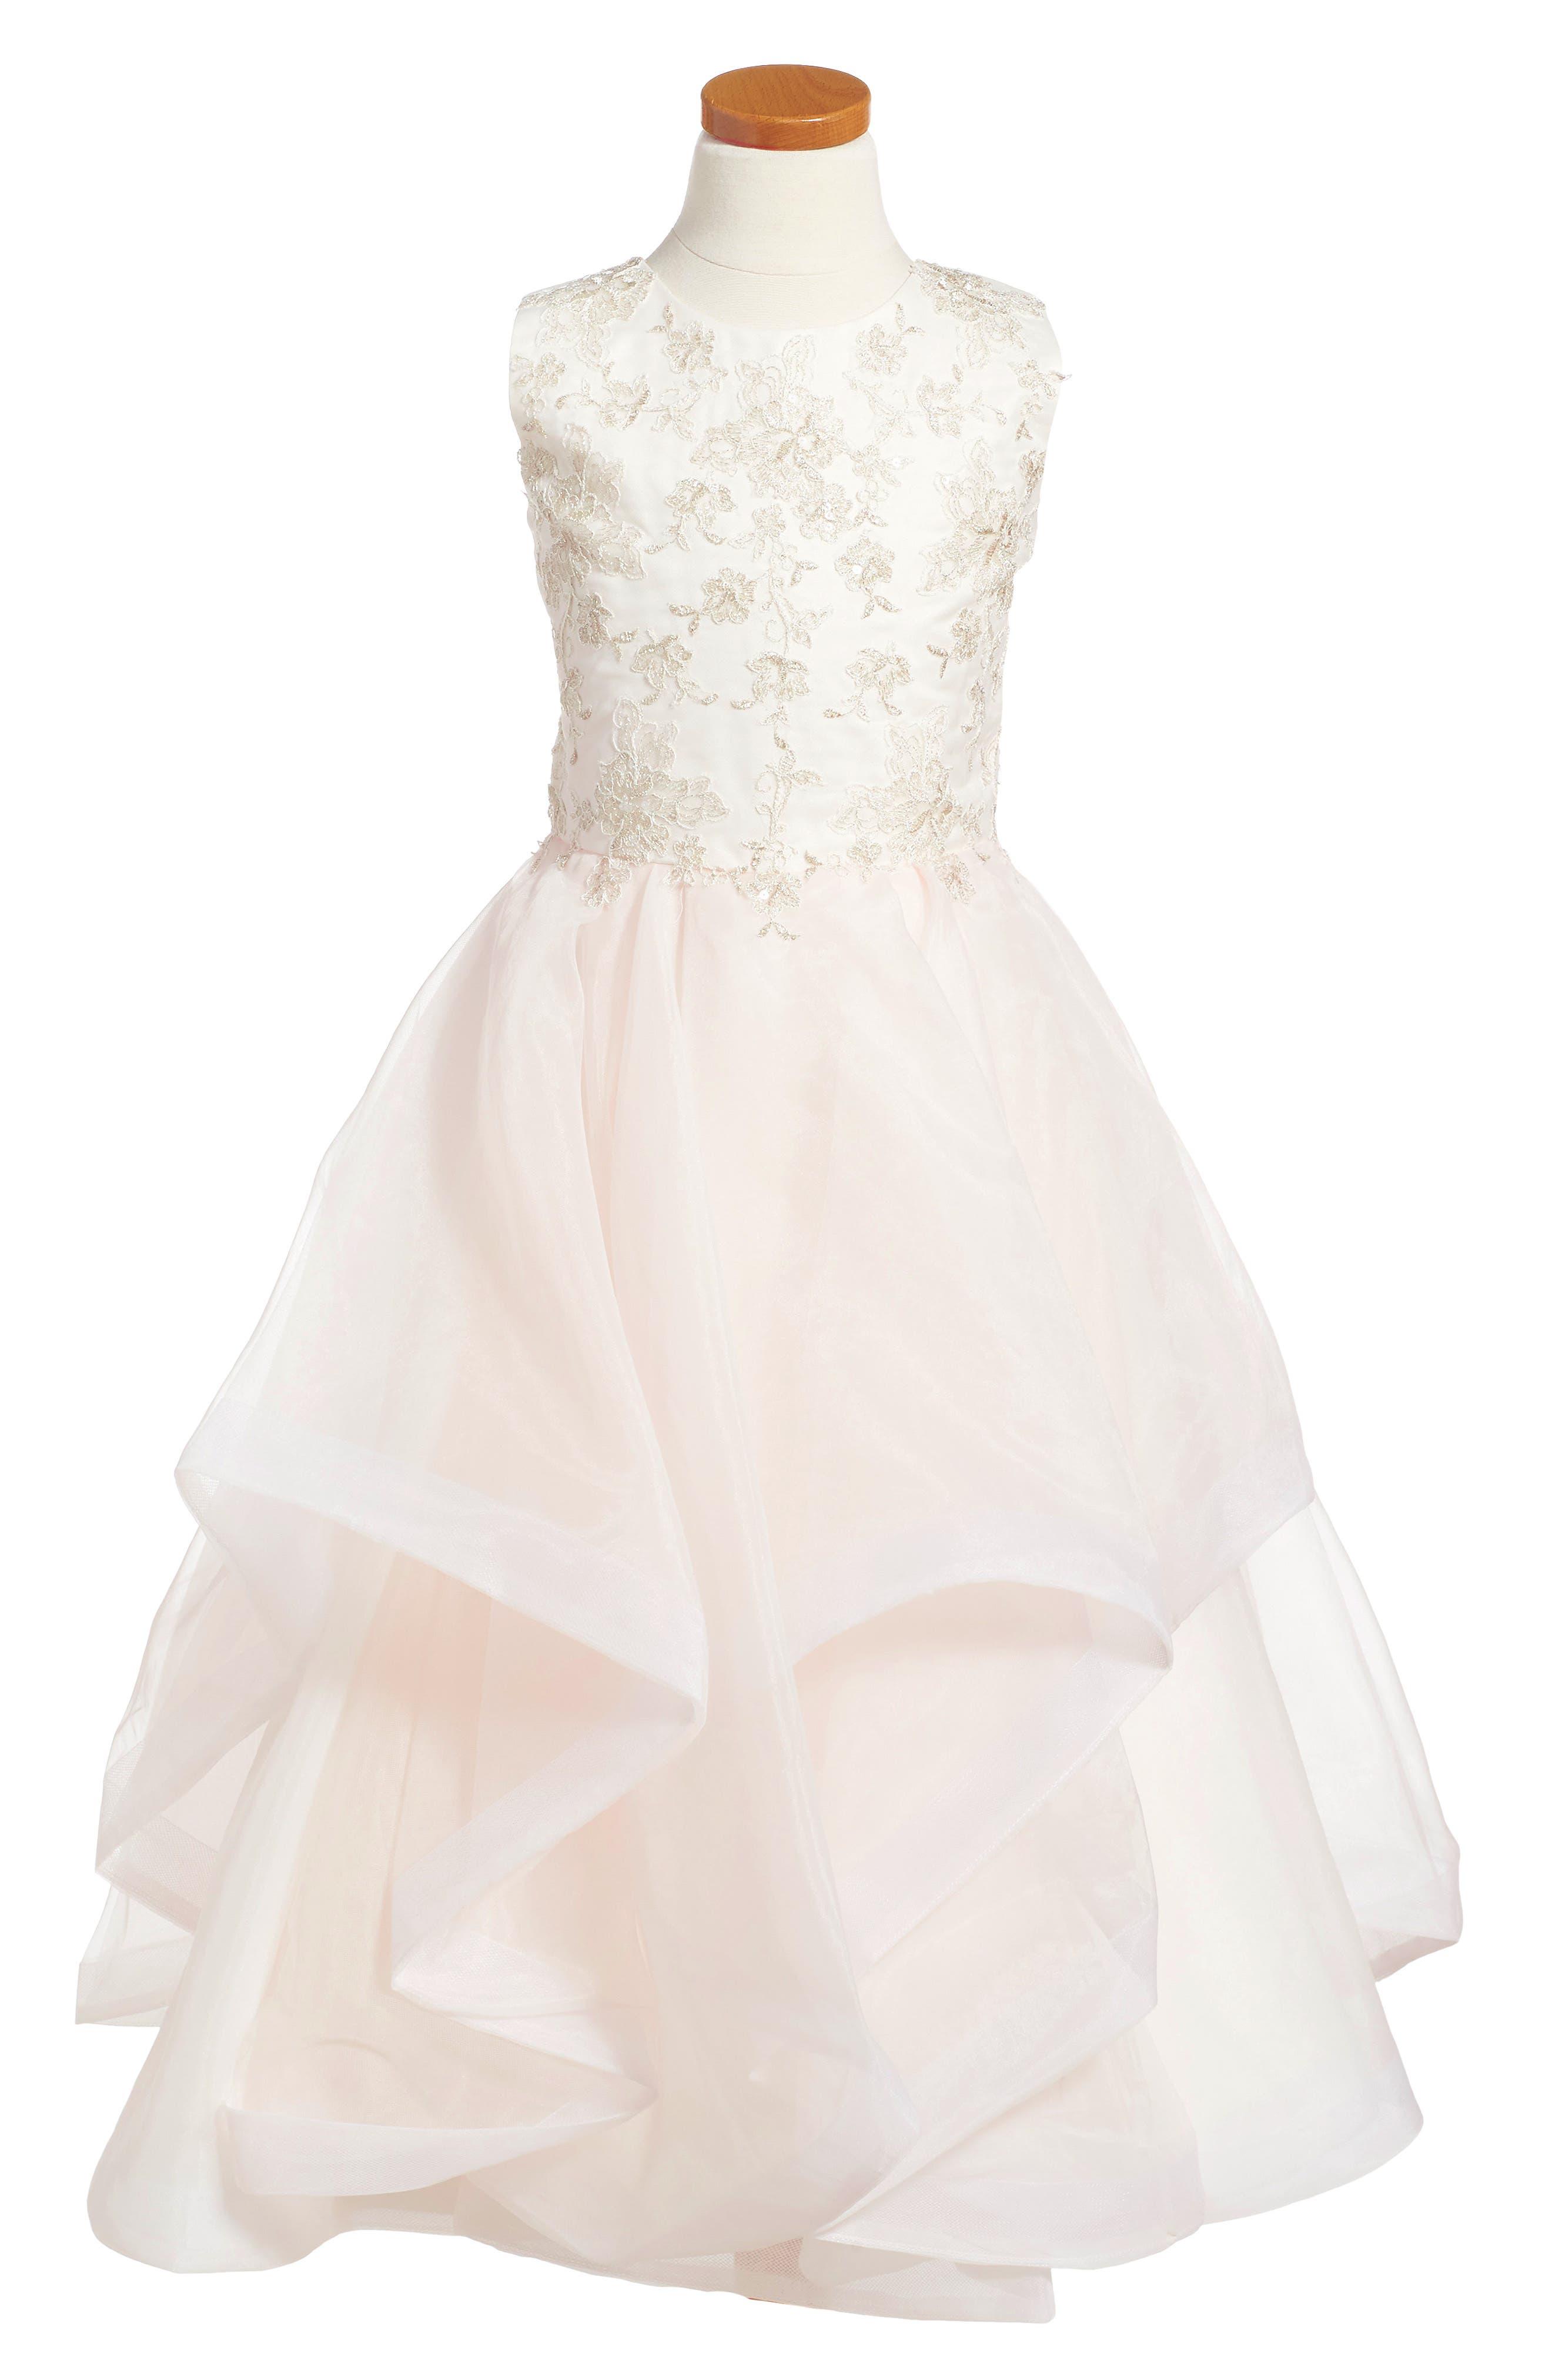 Tulle & Organza Dress,                         Main,                         color, 900